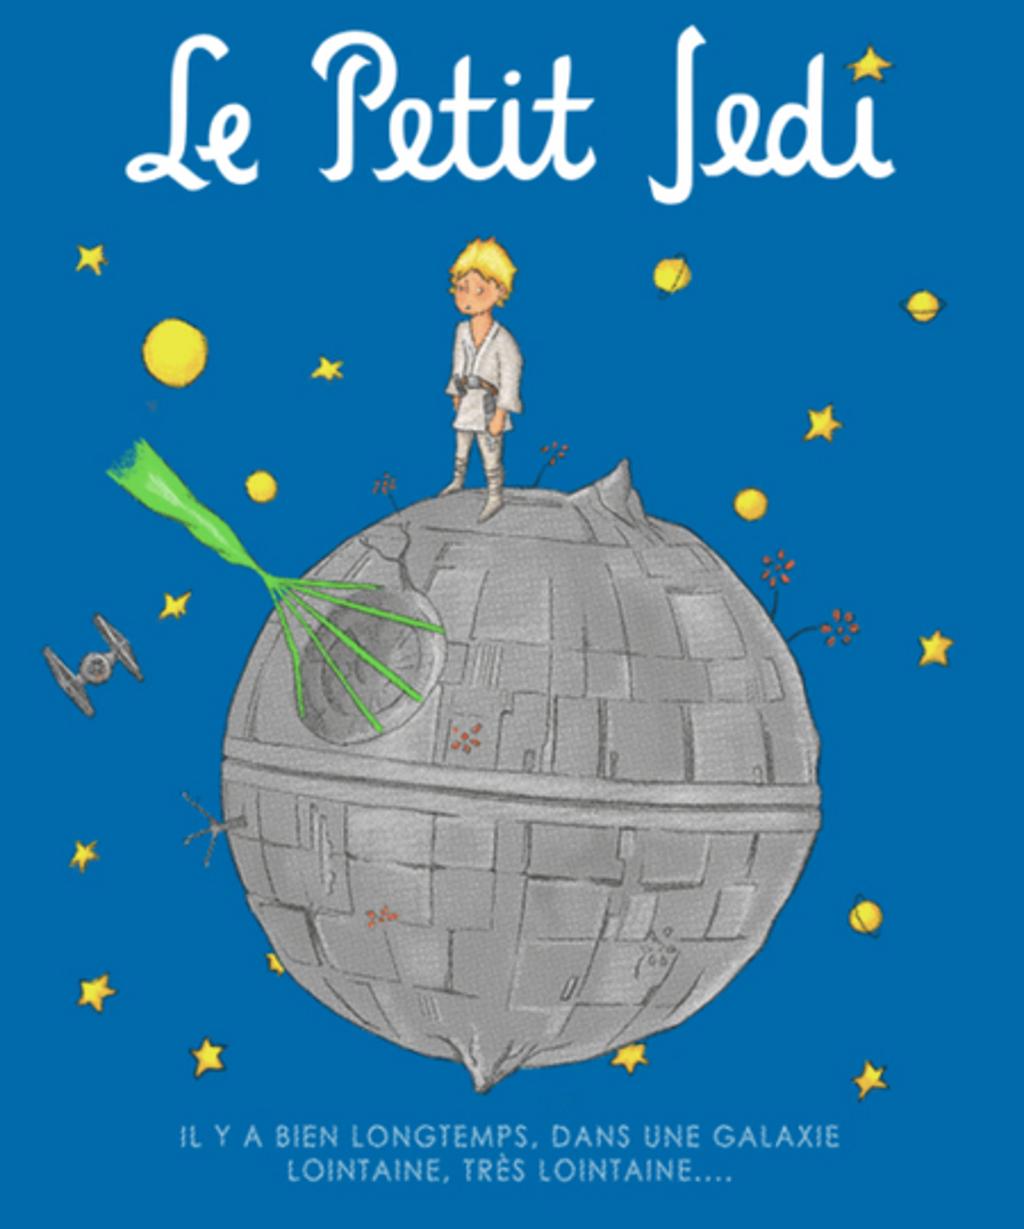 Qwertee: Le Petit Jedi